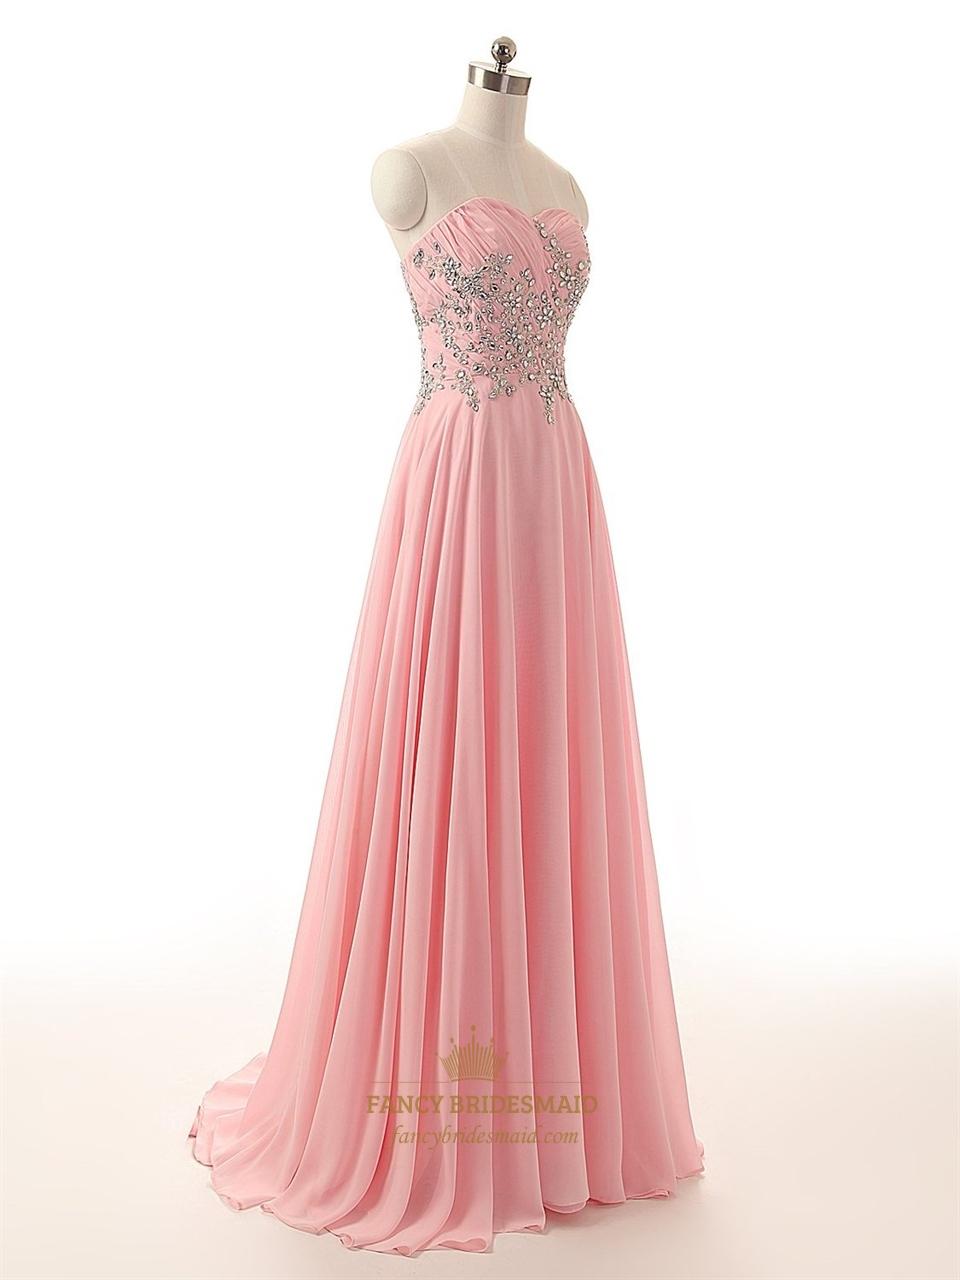 Image Result For Wedding Dress Warehouse